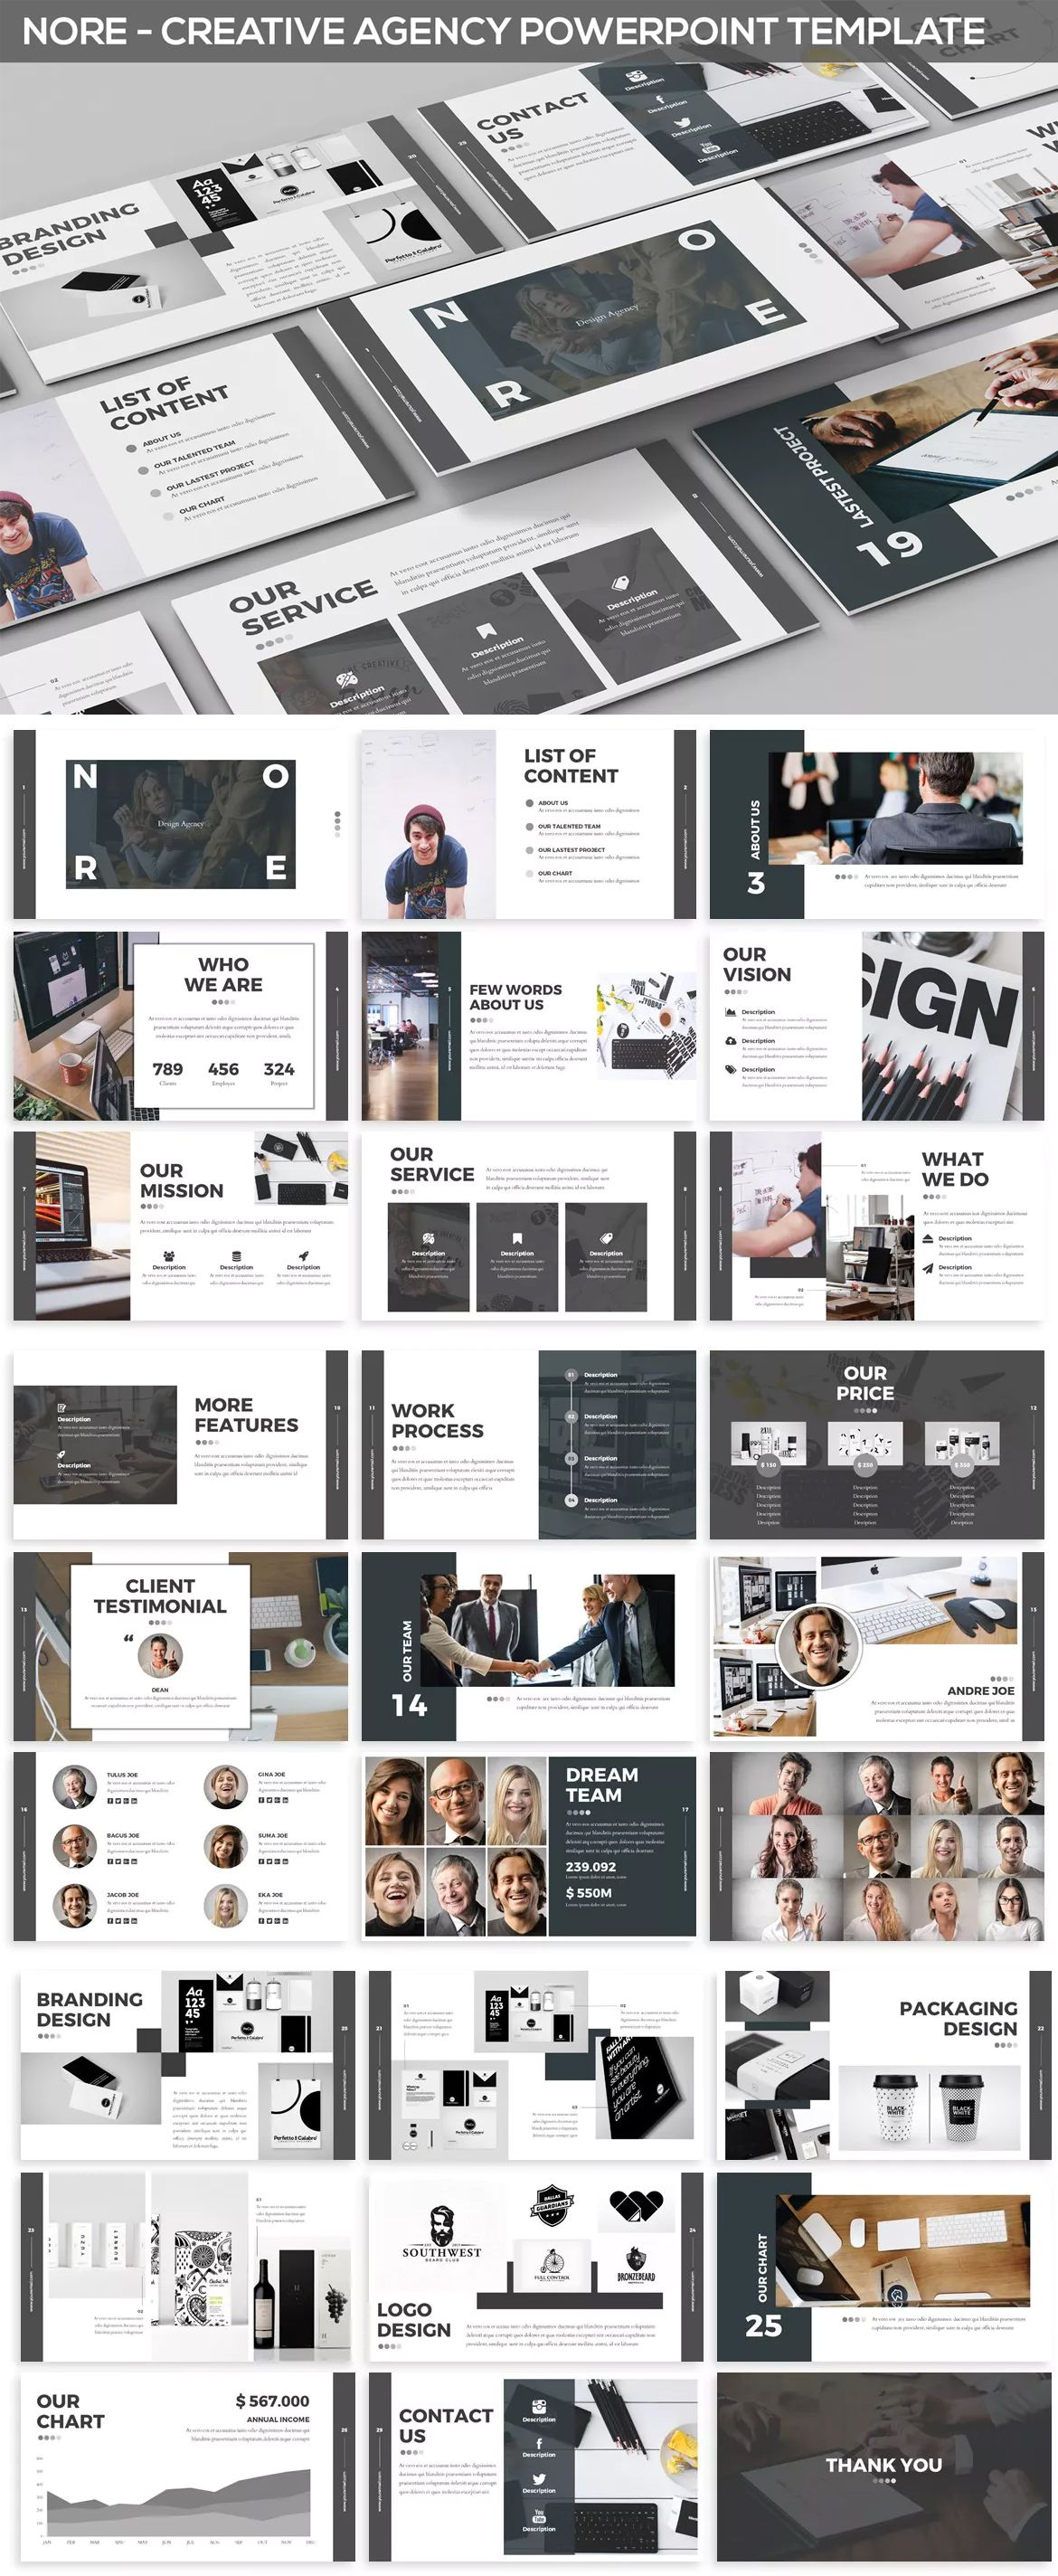 Nore Design Agency Powerpoint Presentation Template 30 Unique